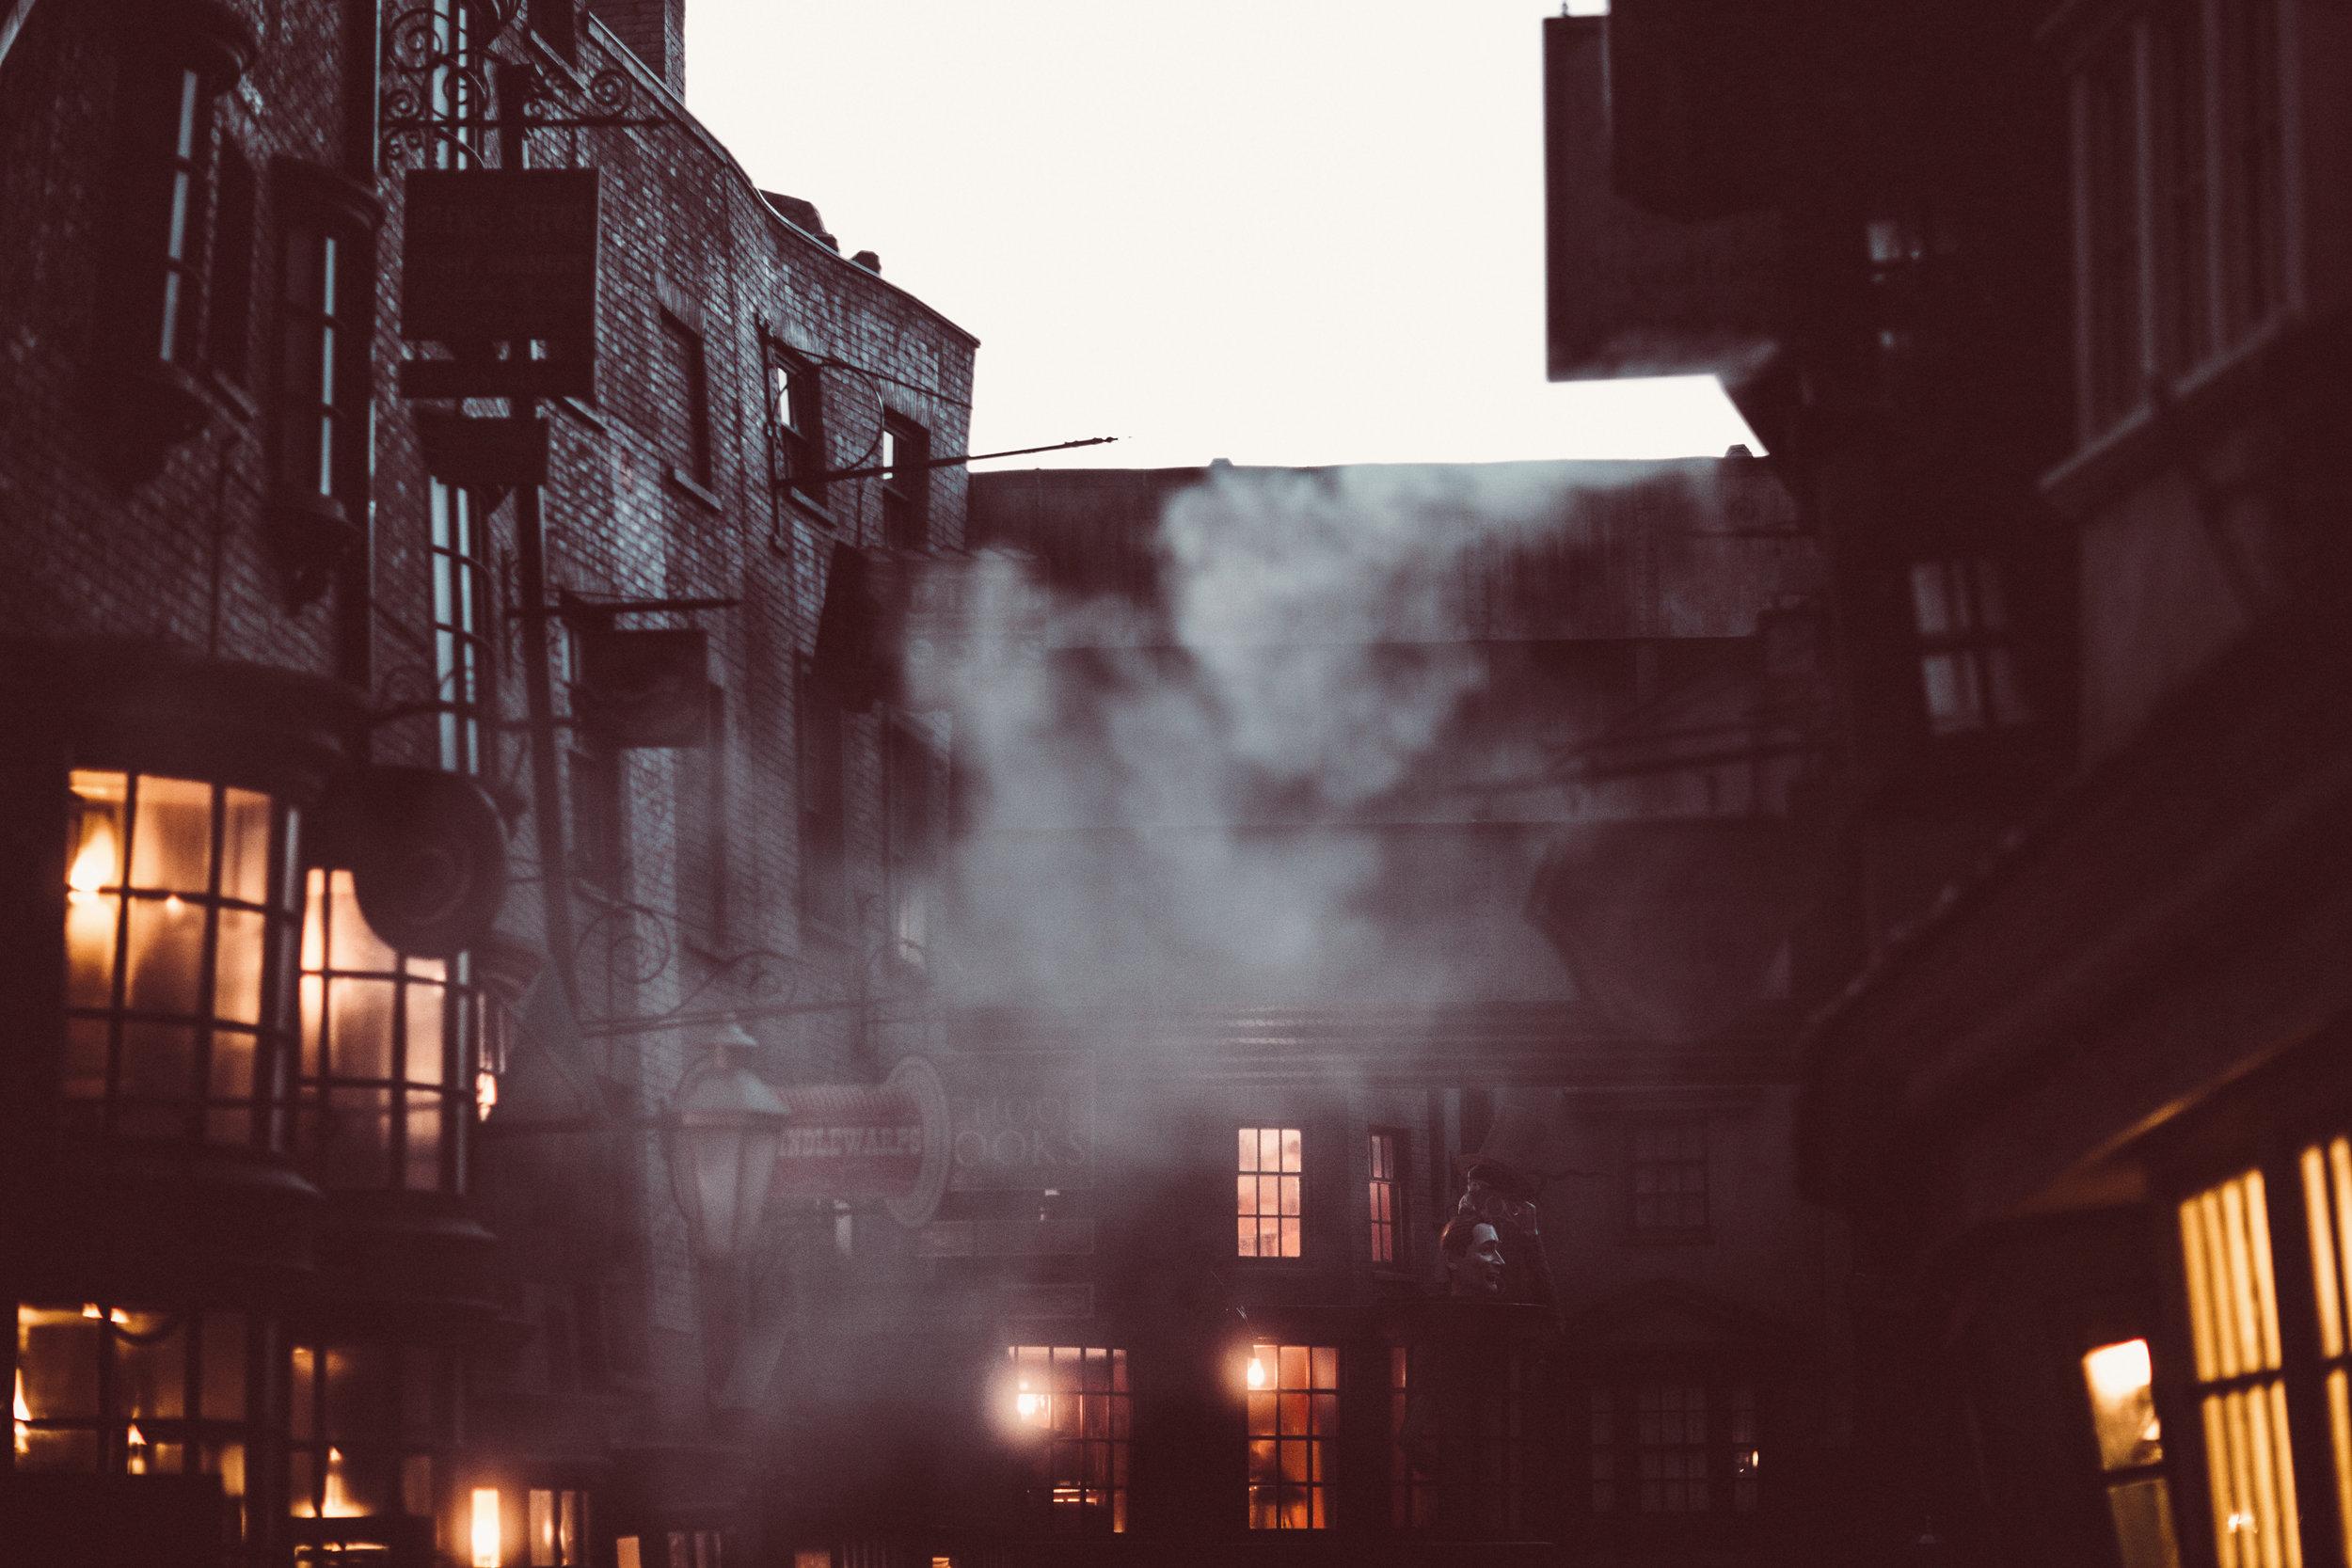 Universal Orlando | Vanessa Boy Photography | vanessaboy.com |-20.com |final2.jpg